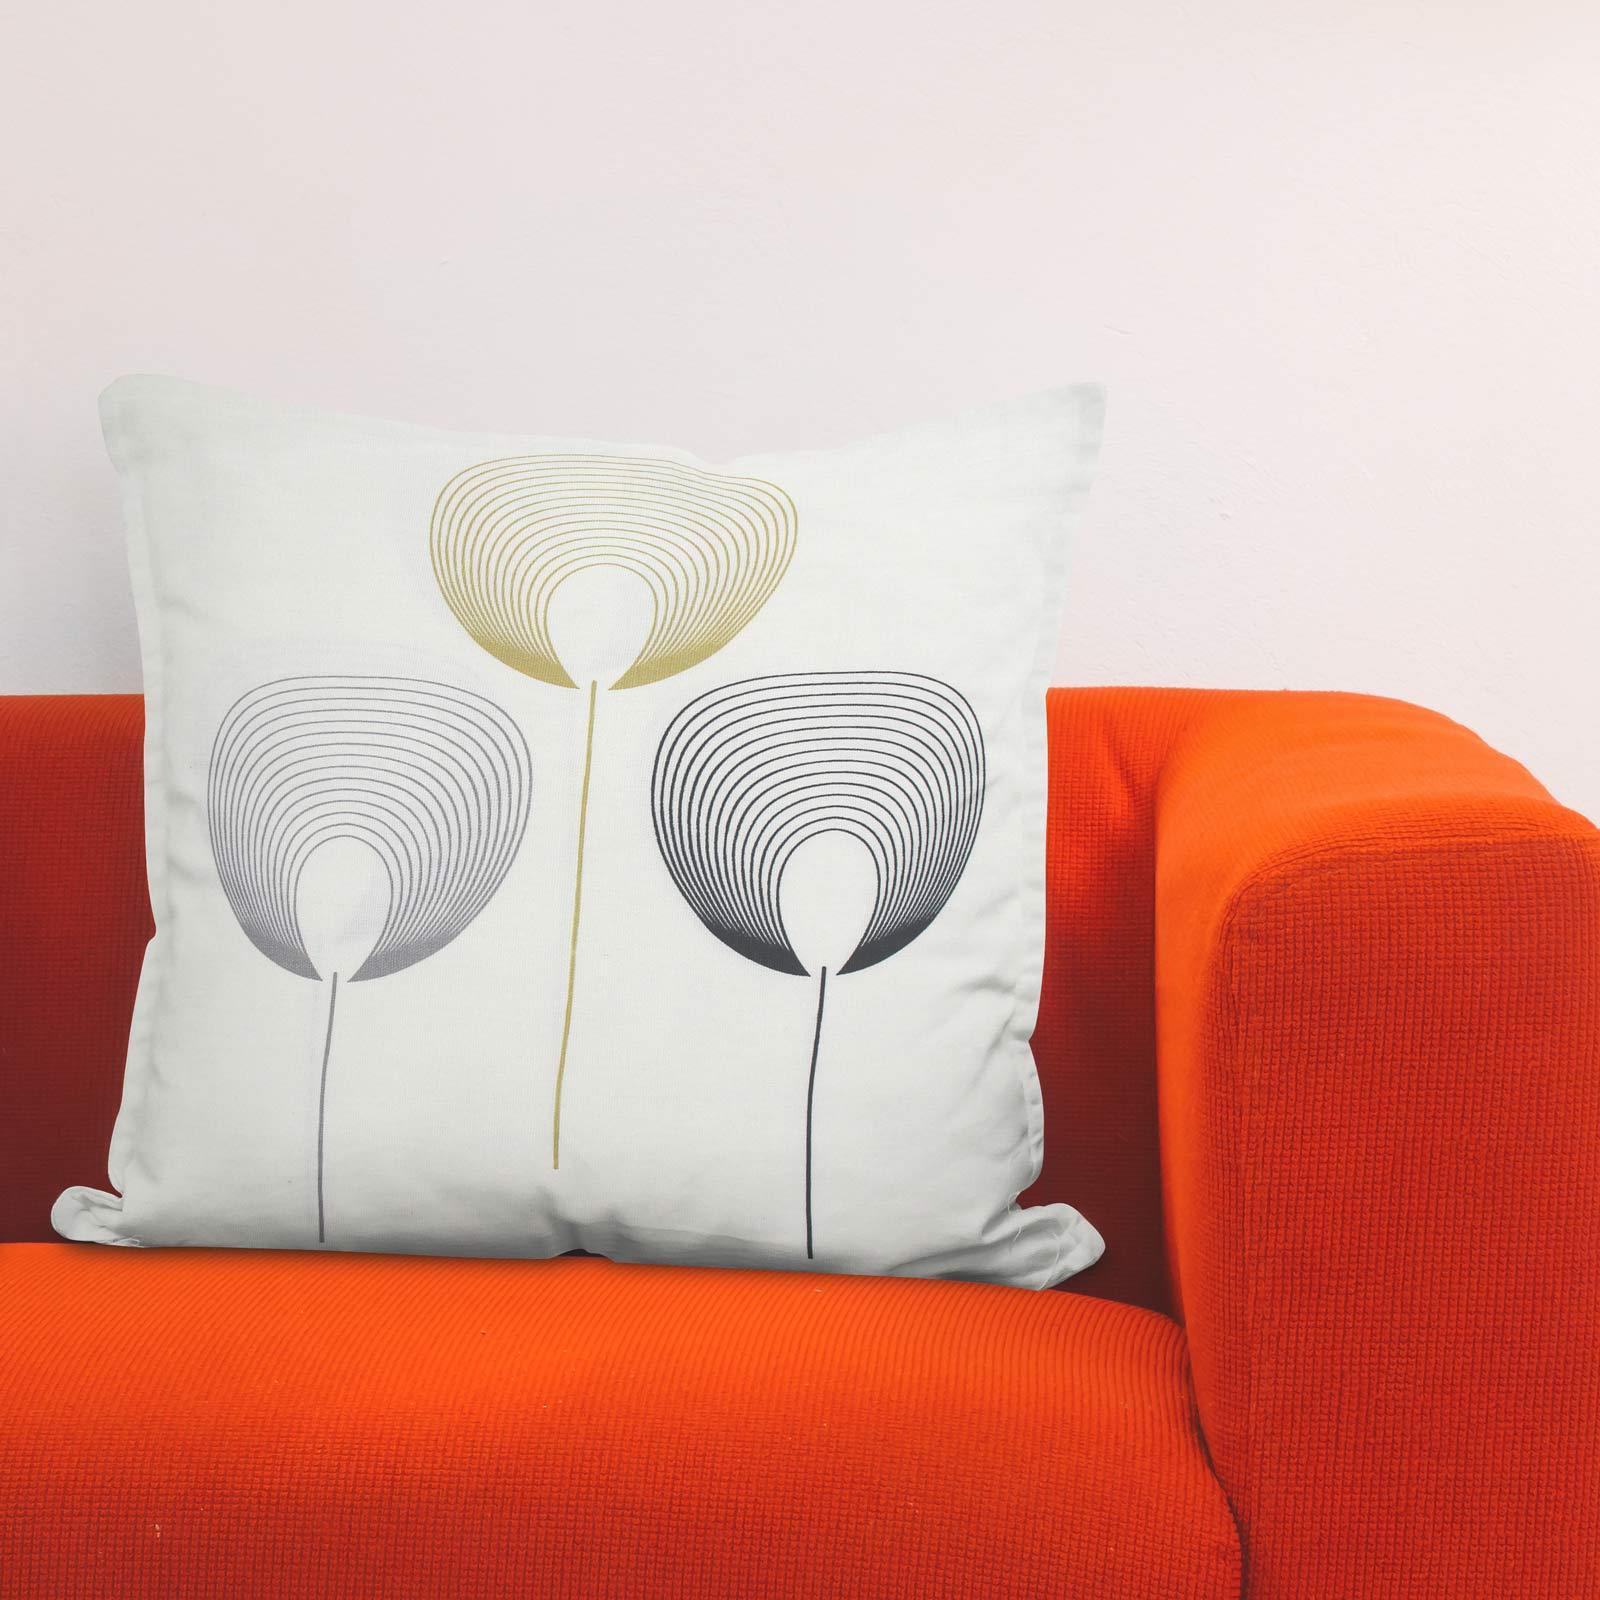 Geometrica-Cushion-Covers-Cojines-De-Impresion-Floral-Gris-Beige-Ocre-cubre-17-034-X-17-034 miniatura 13